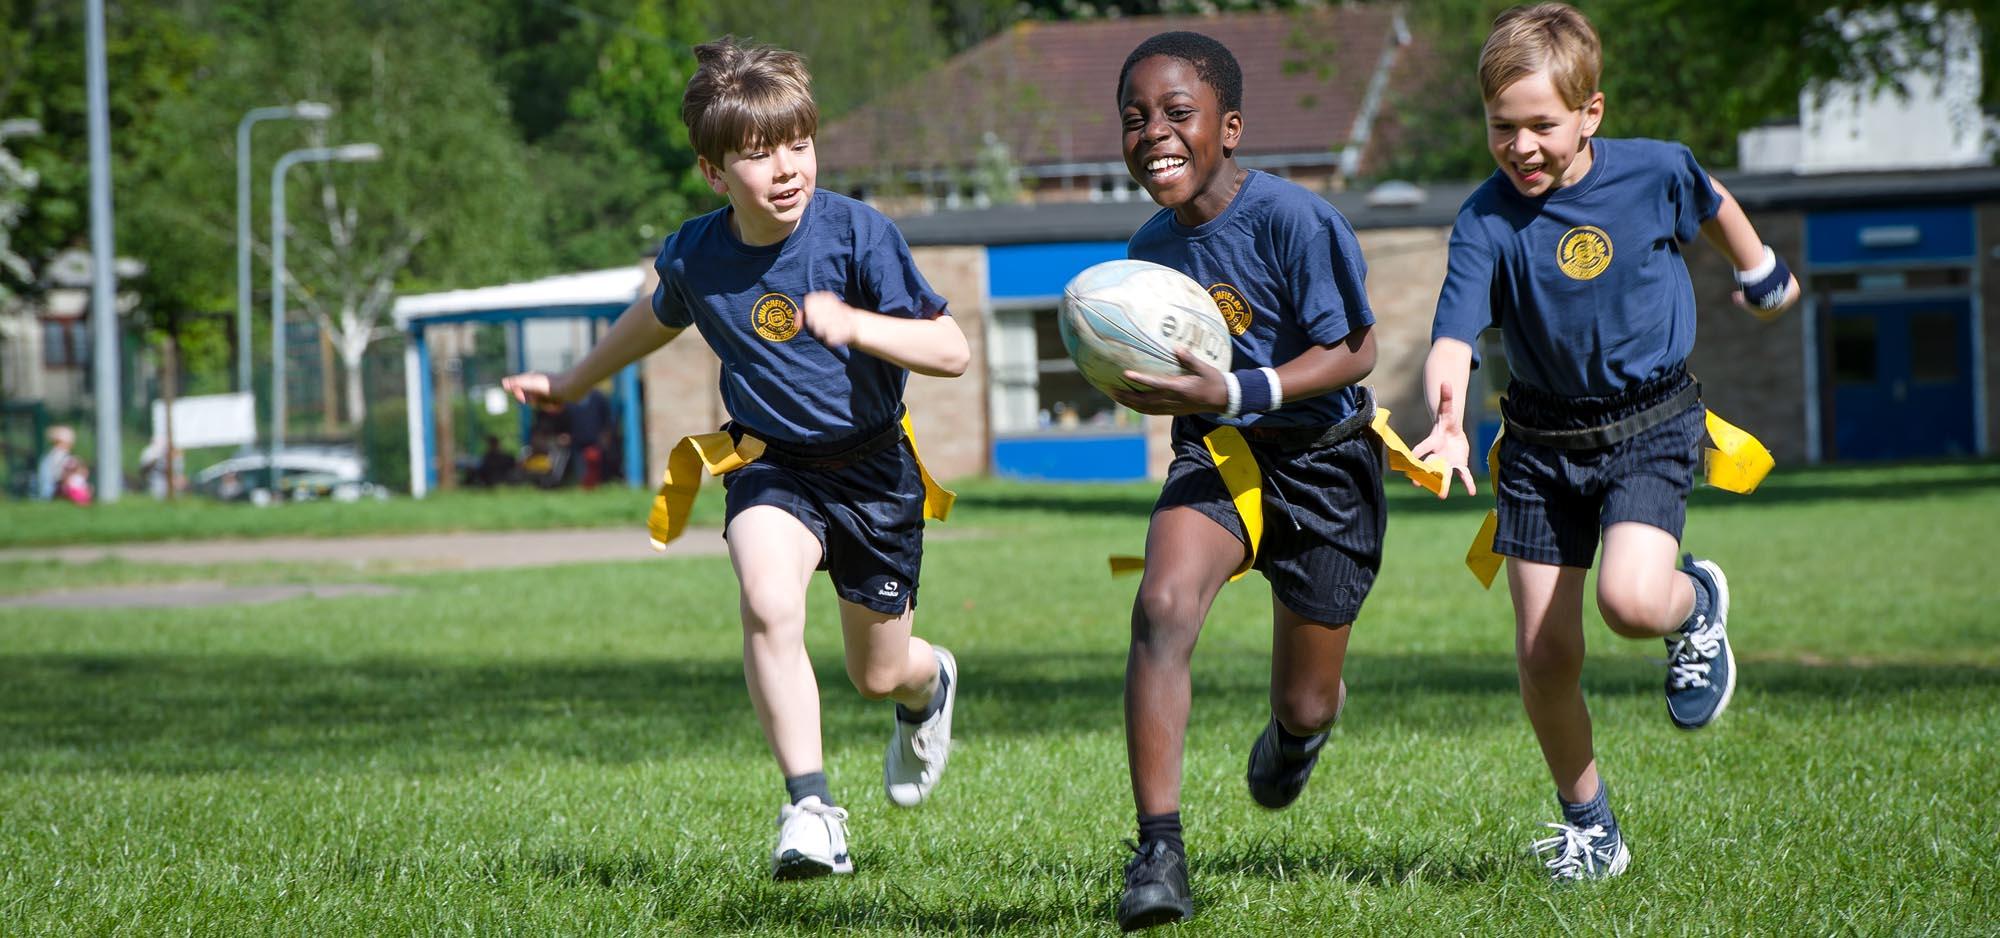 boys-running-rugby